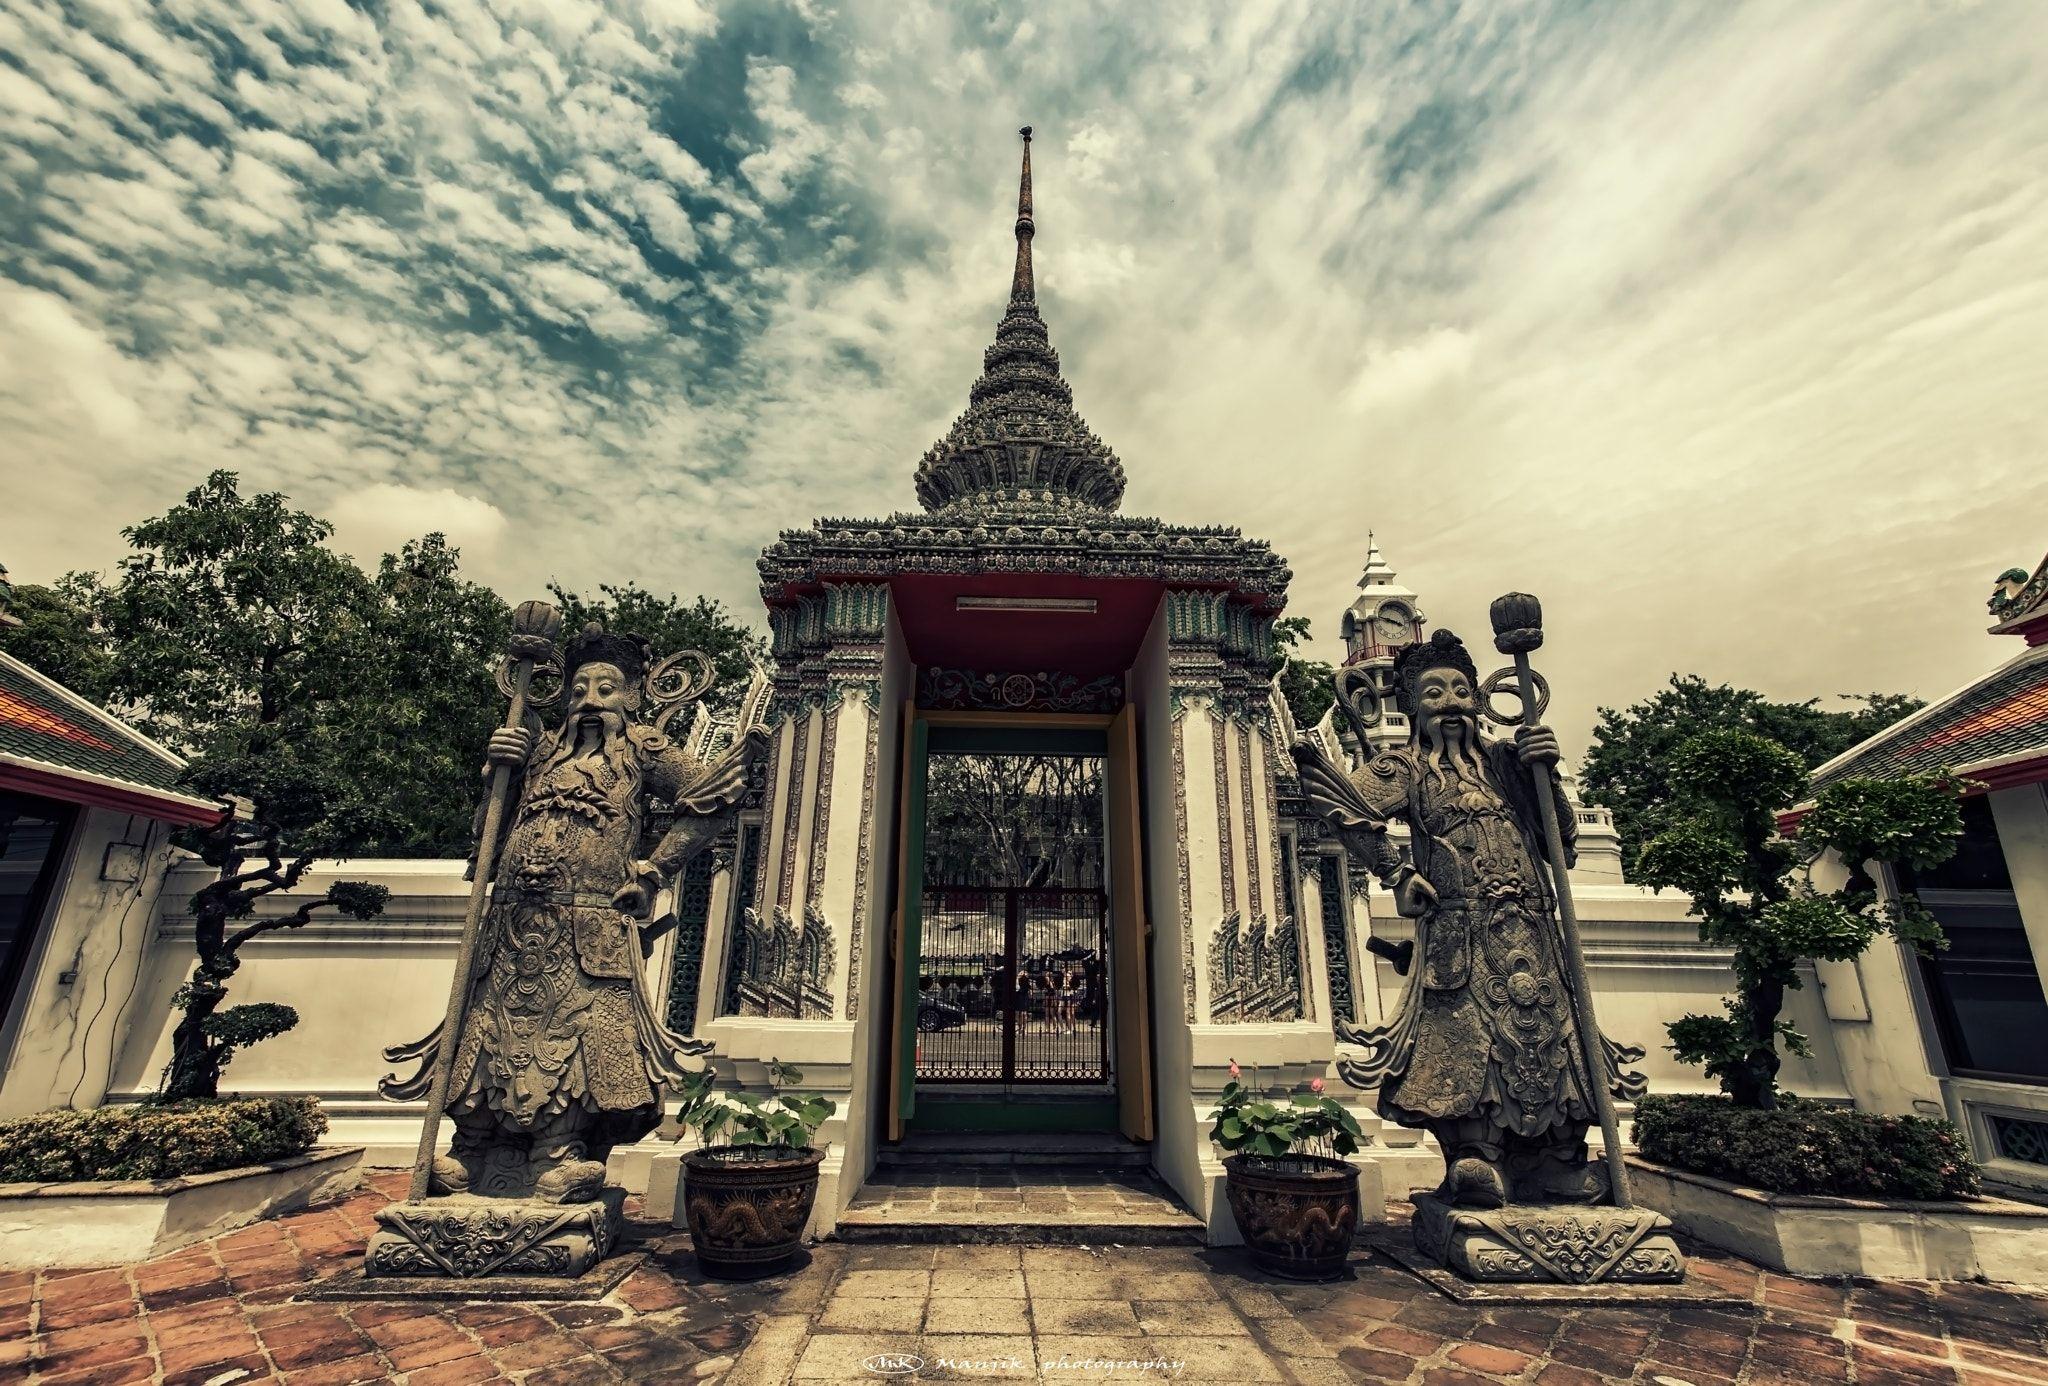 "Guardians - Wat Pho in Bangkok  Feel free to follow me on : <a href=""https://www.facebook.com/manjik.photography"">Facebook</a>  <a href=""https://www.flickr.com/photos/127381755@N02/"">Flickr</a> <a href=""https://www.instagram.com/manjikphotography"">Instagram</a> <a href=""https://twitter.com/ManjikPictures"">Twitter</a>"